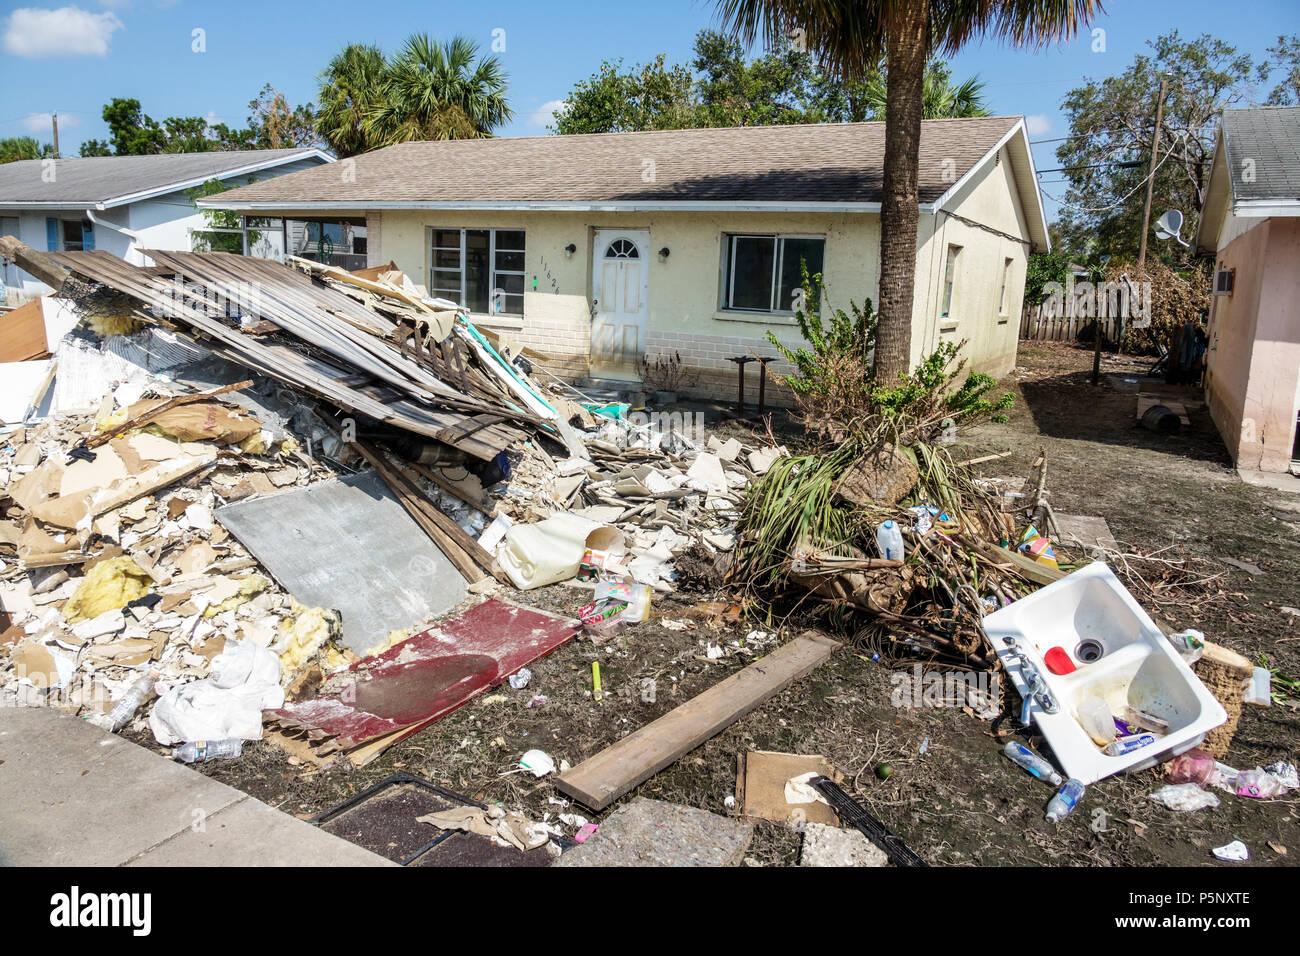 Bonita Springs Florida after Hurricane Irma storm water damage destruction aftermath flooding house home front yard debris trash pile flood depth wate - Stock Image